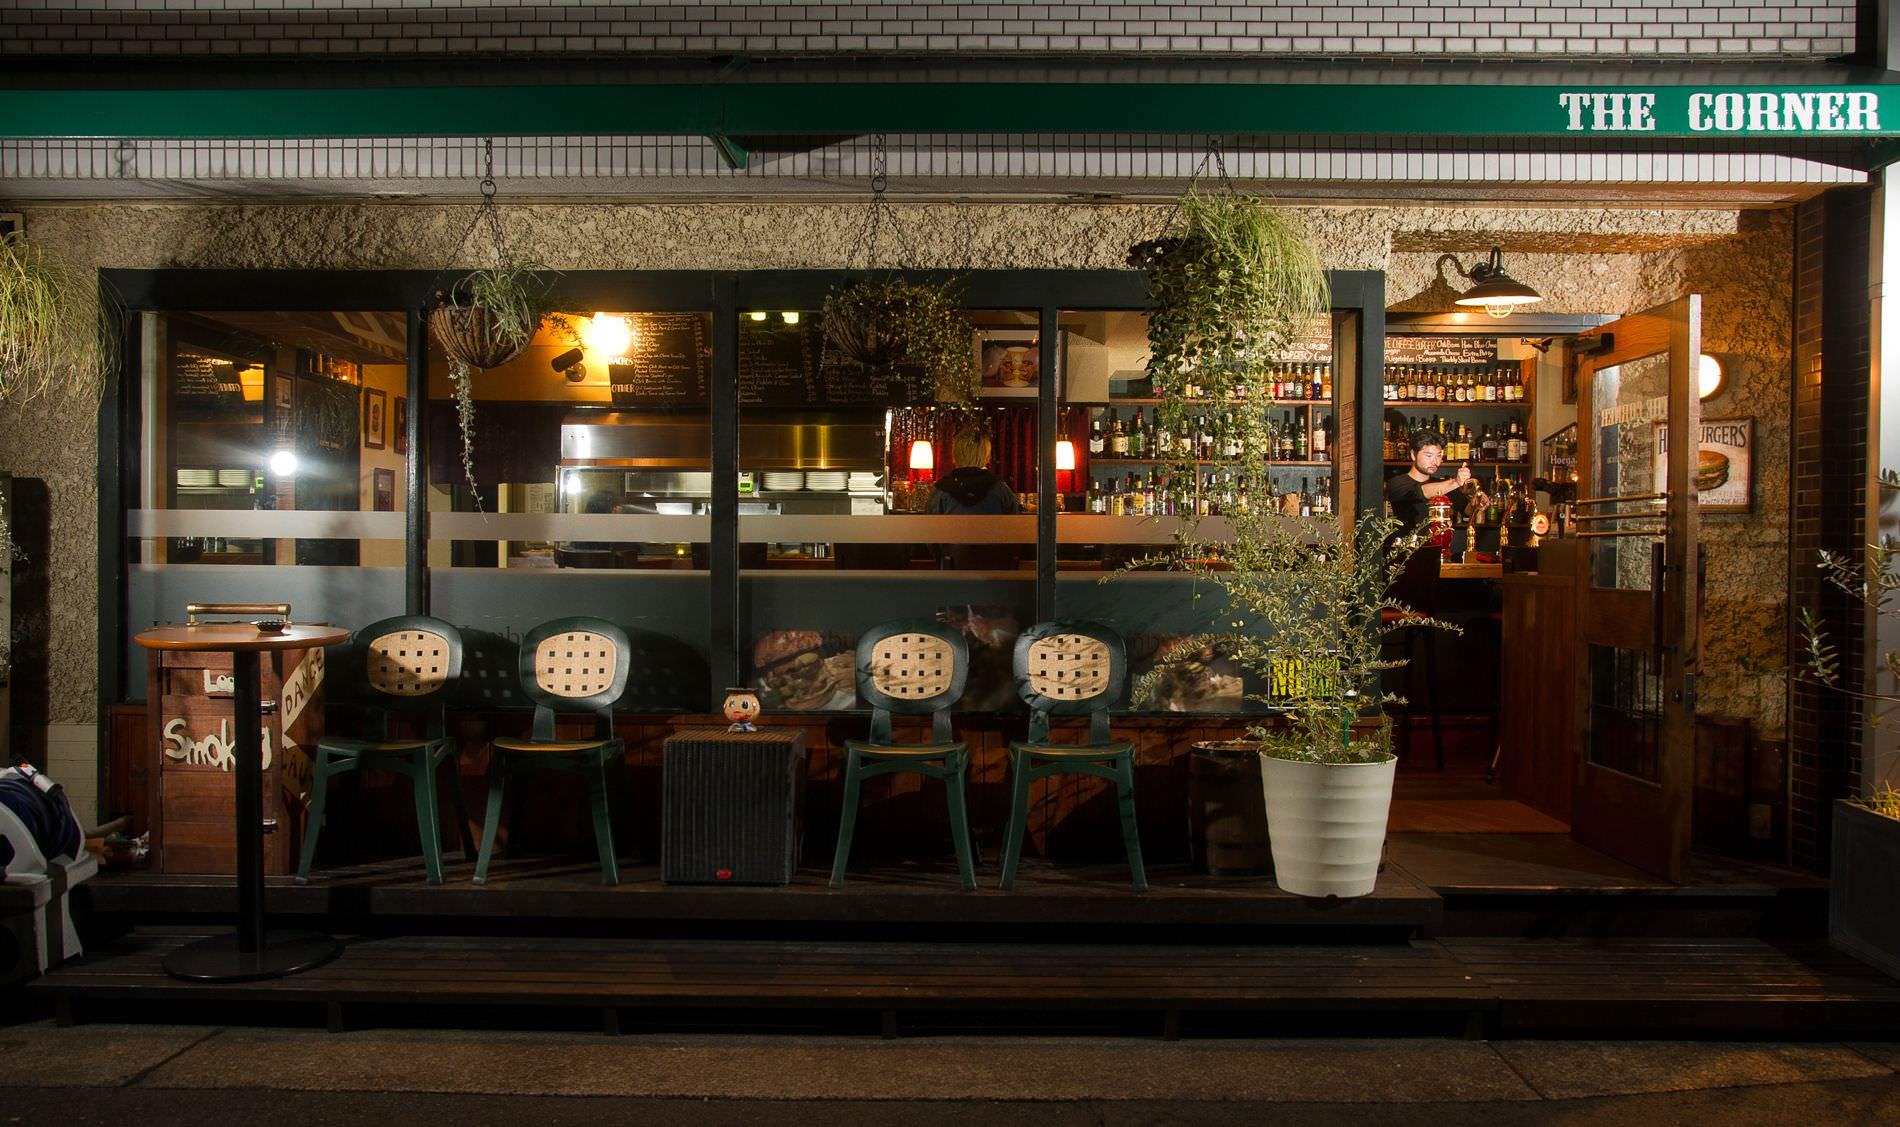 THE CORNER Hamburger&Saloon